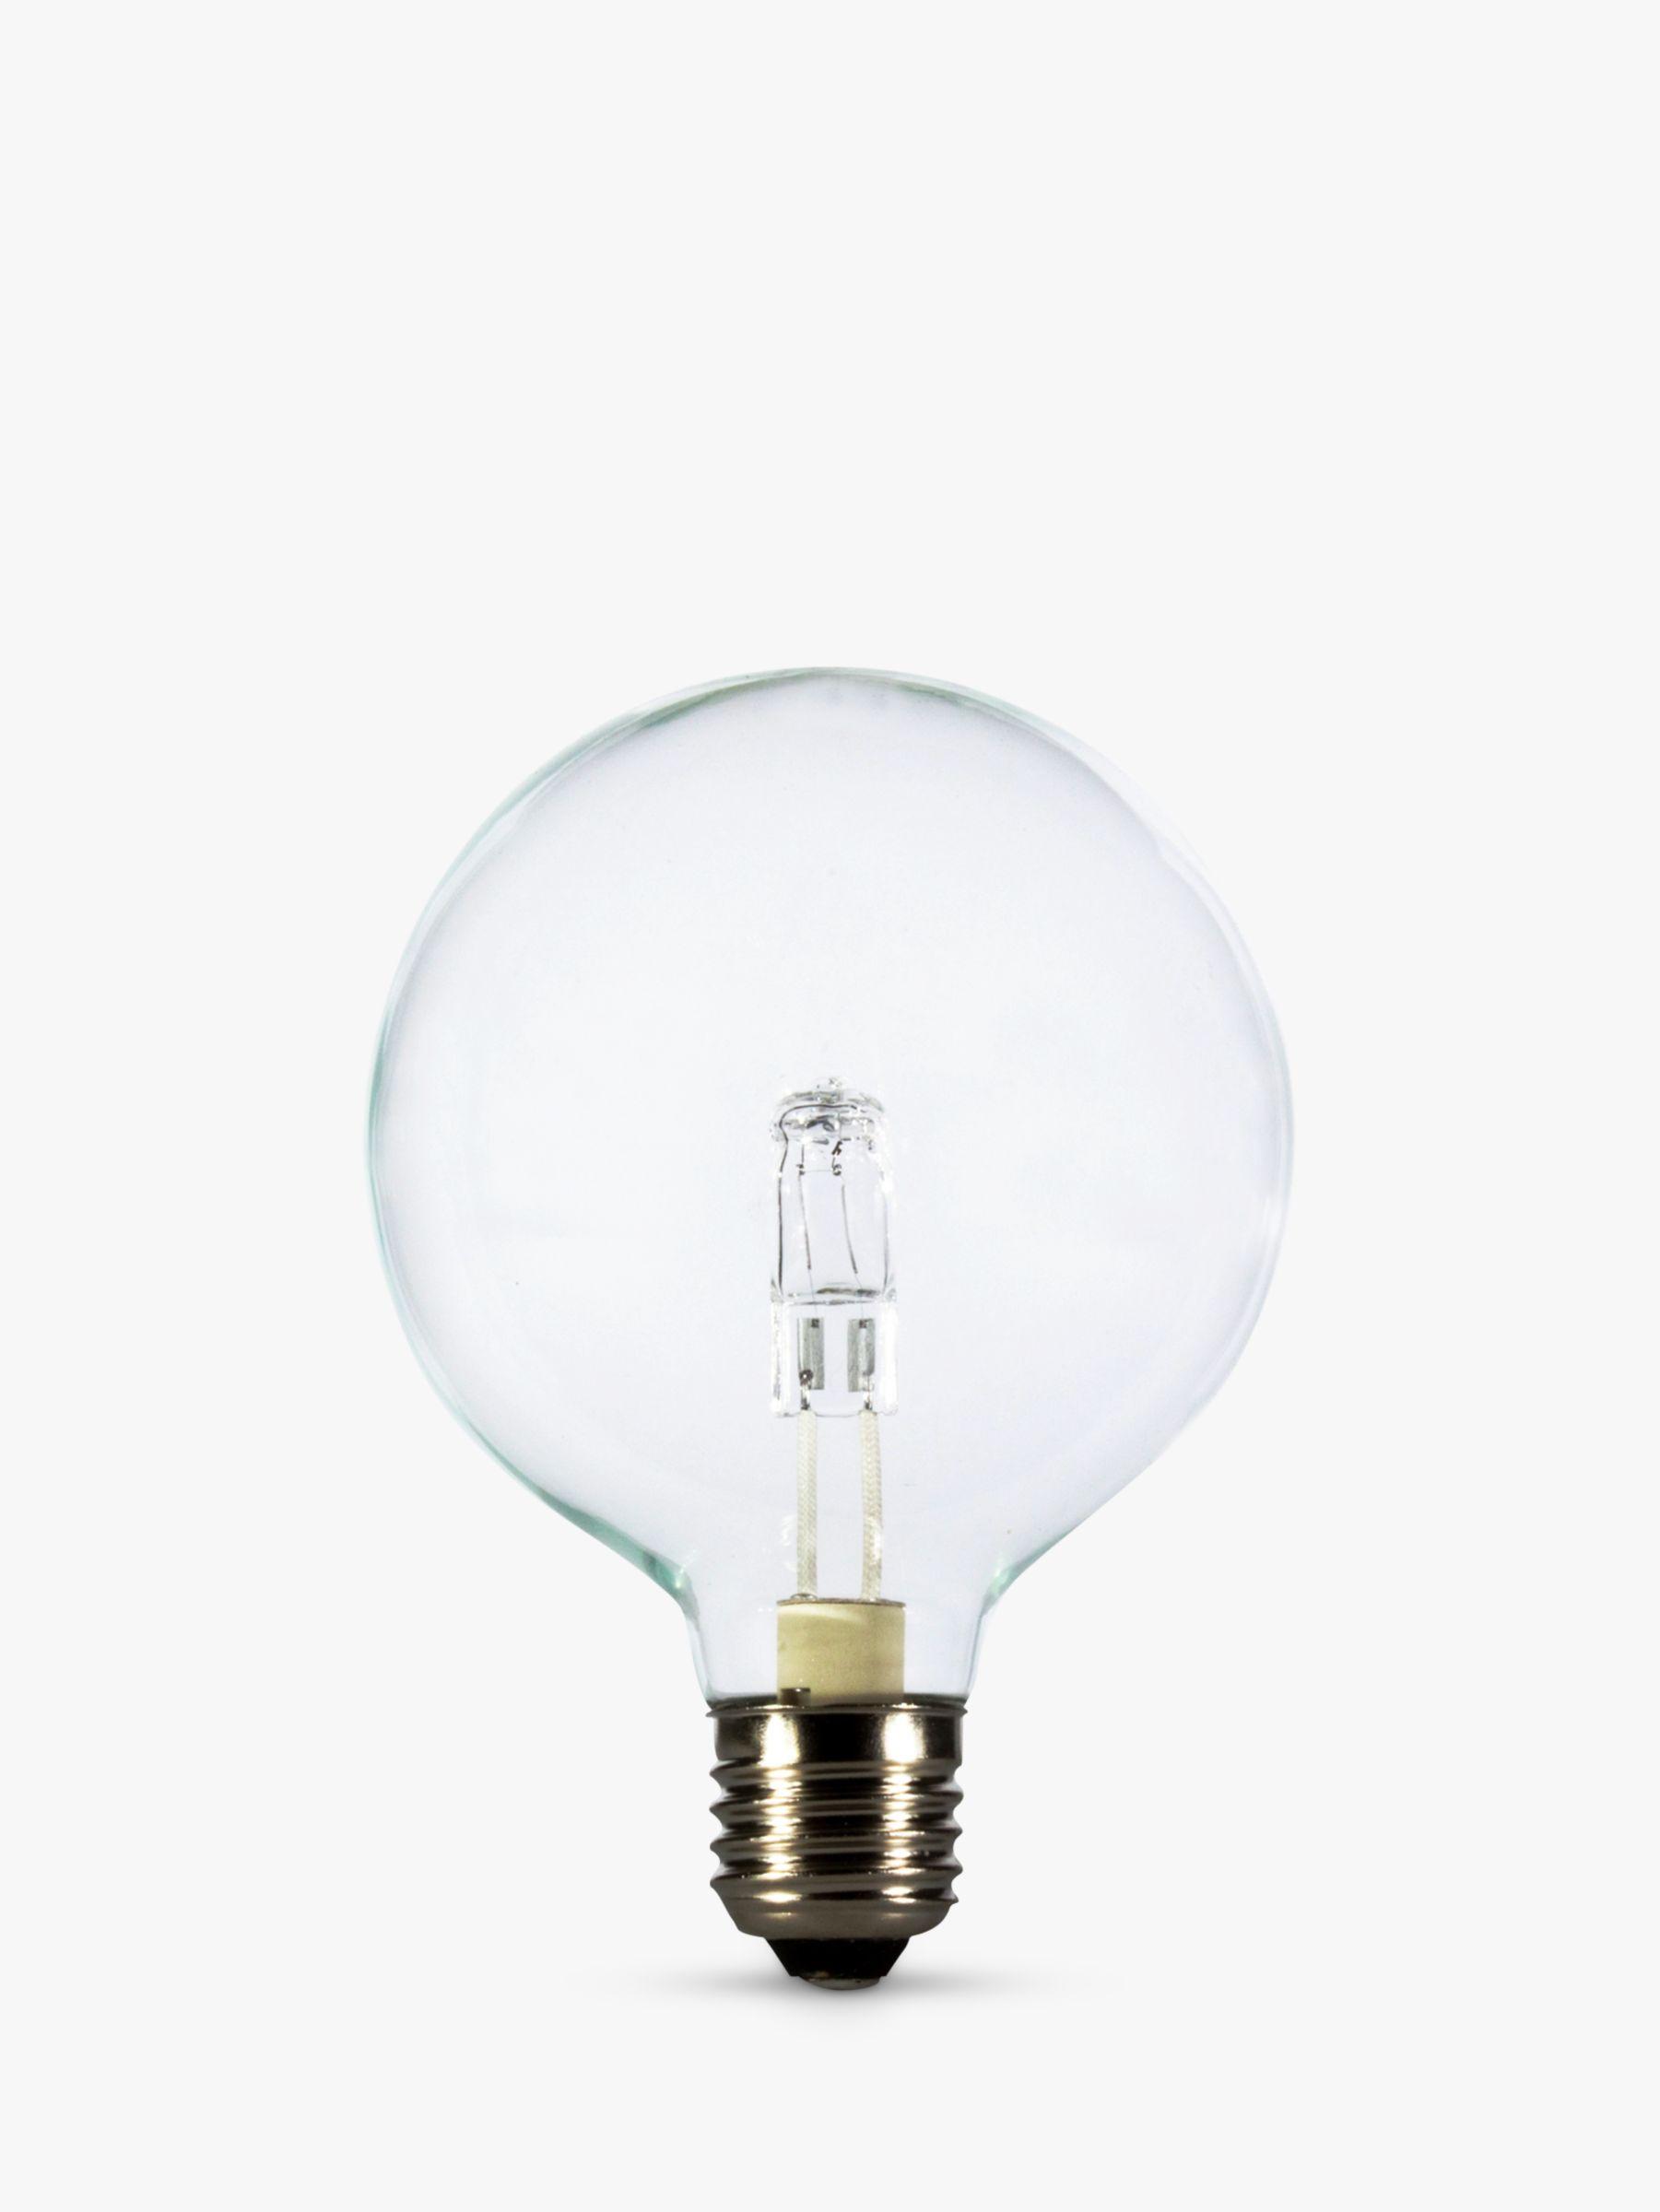 Calex Calex 42W ES Halogen Globe G95 Bulb, Clear